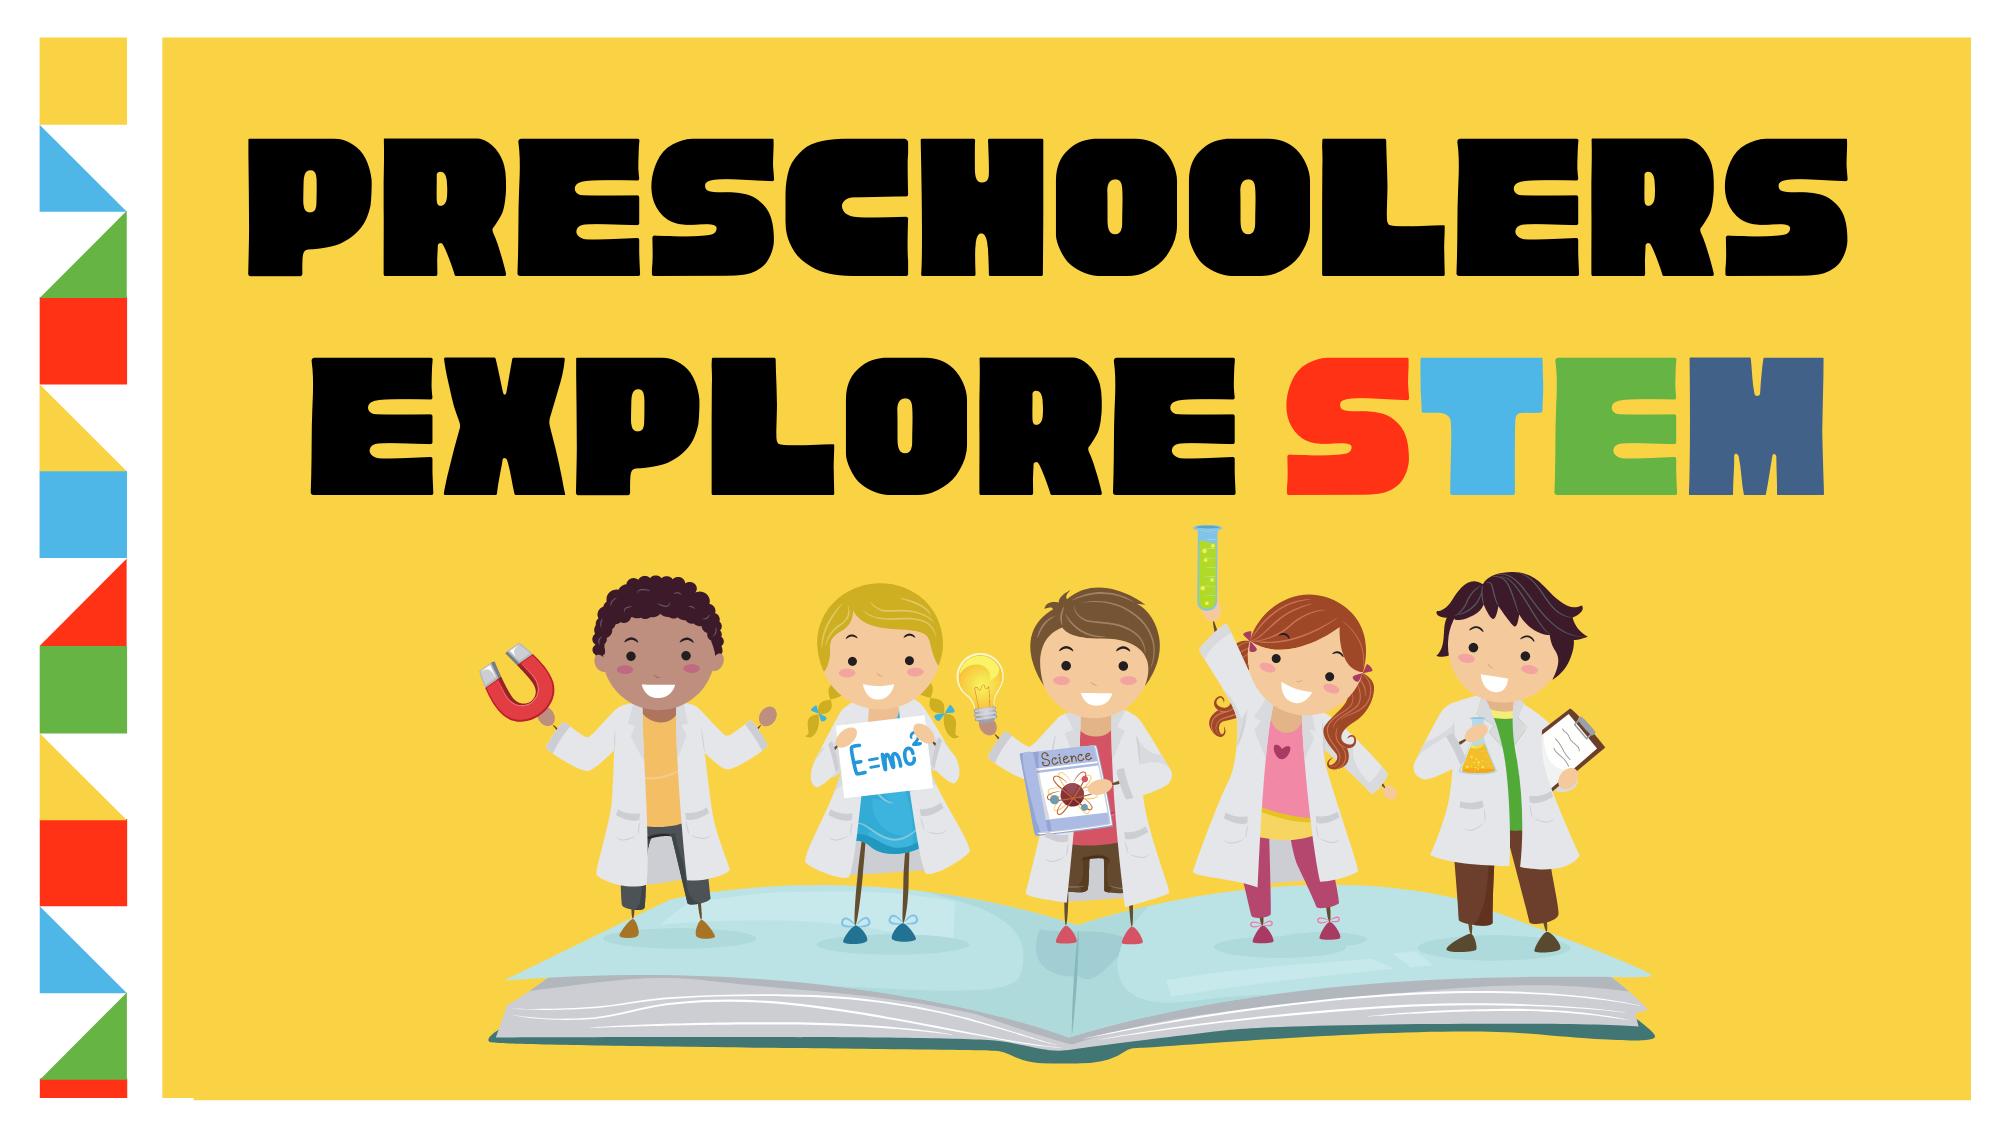 Preschoolers Explore STEM